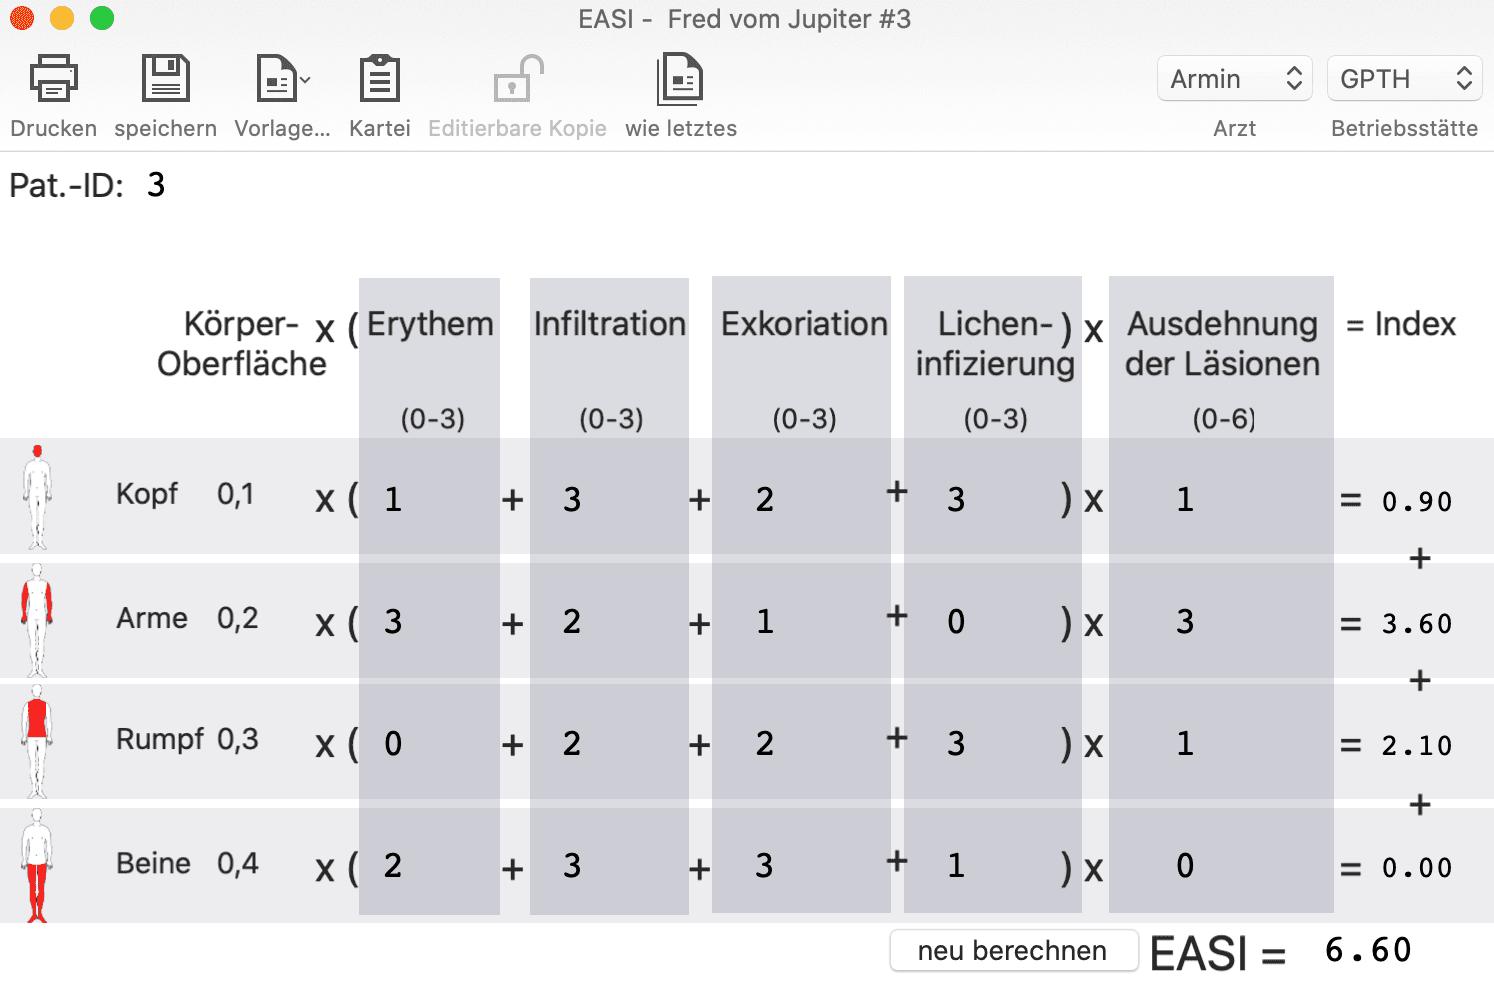 tomedo EASI-Score